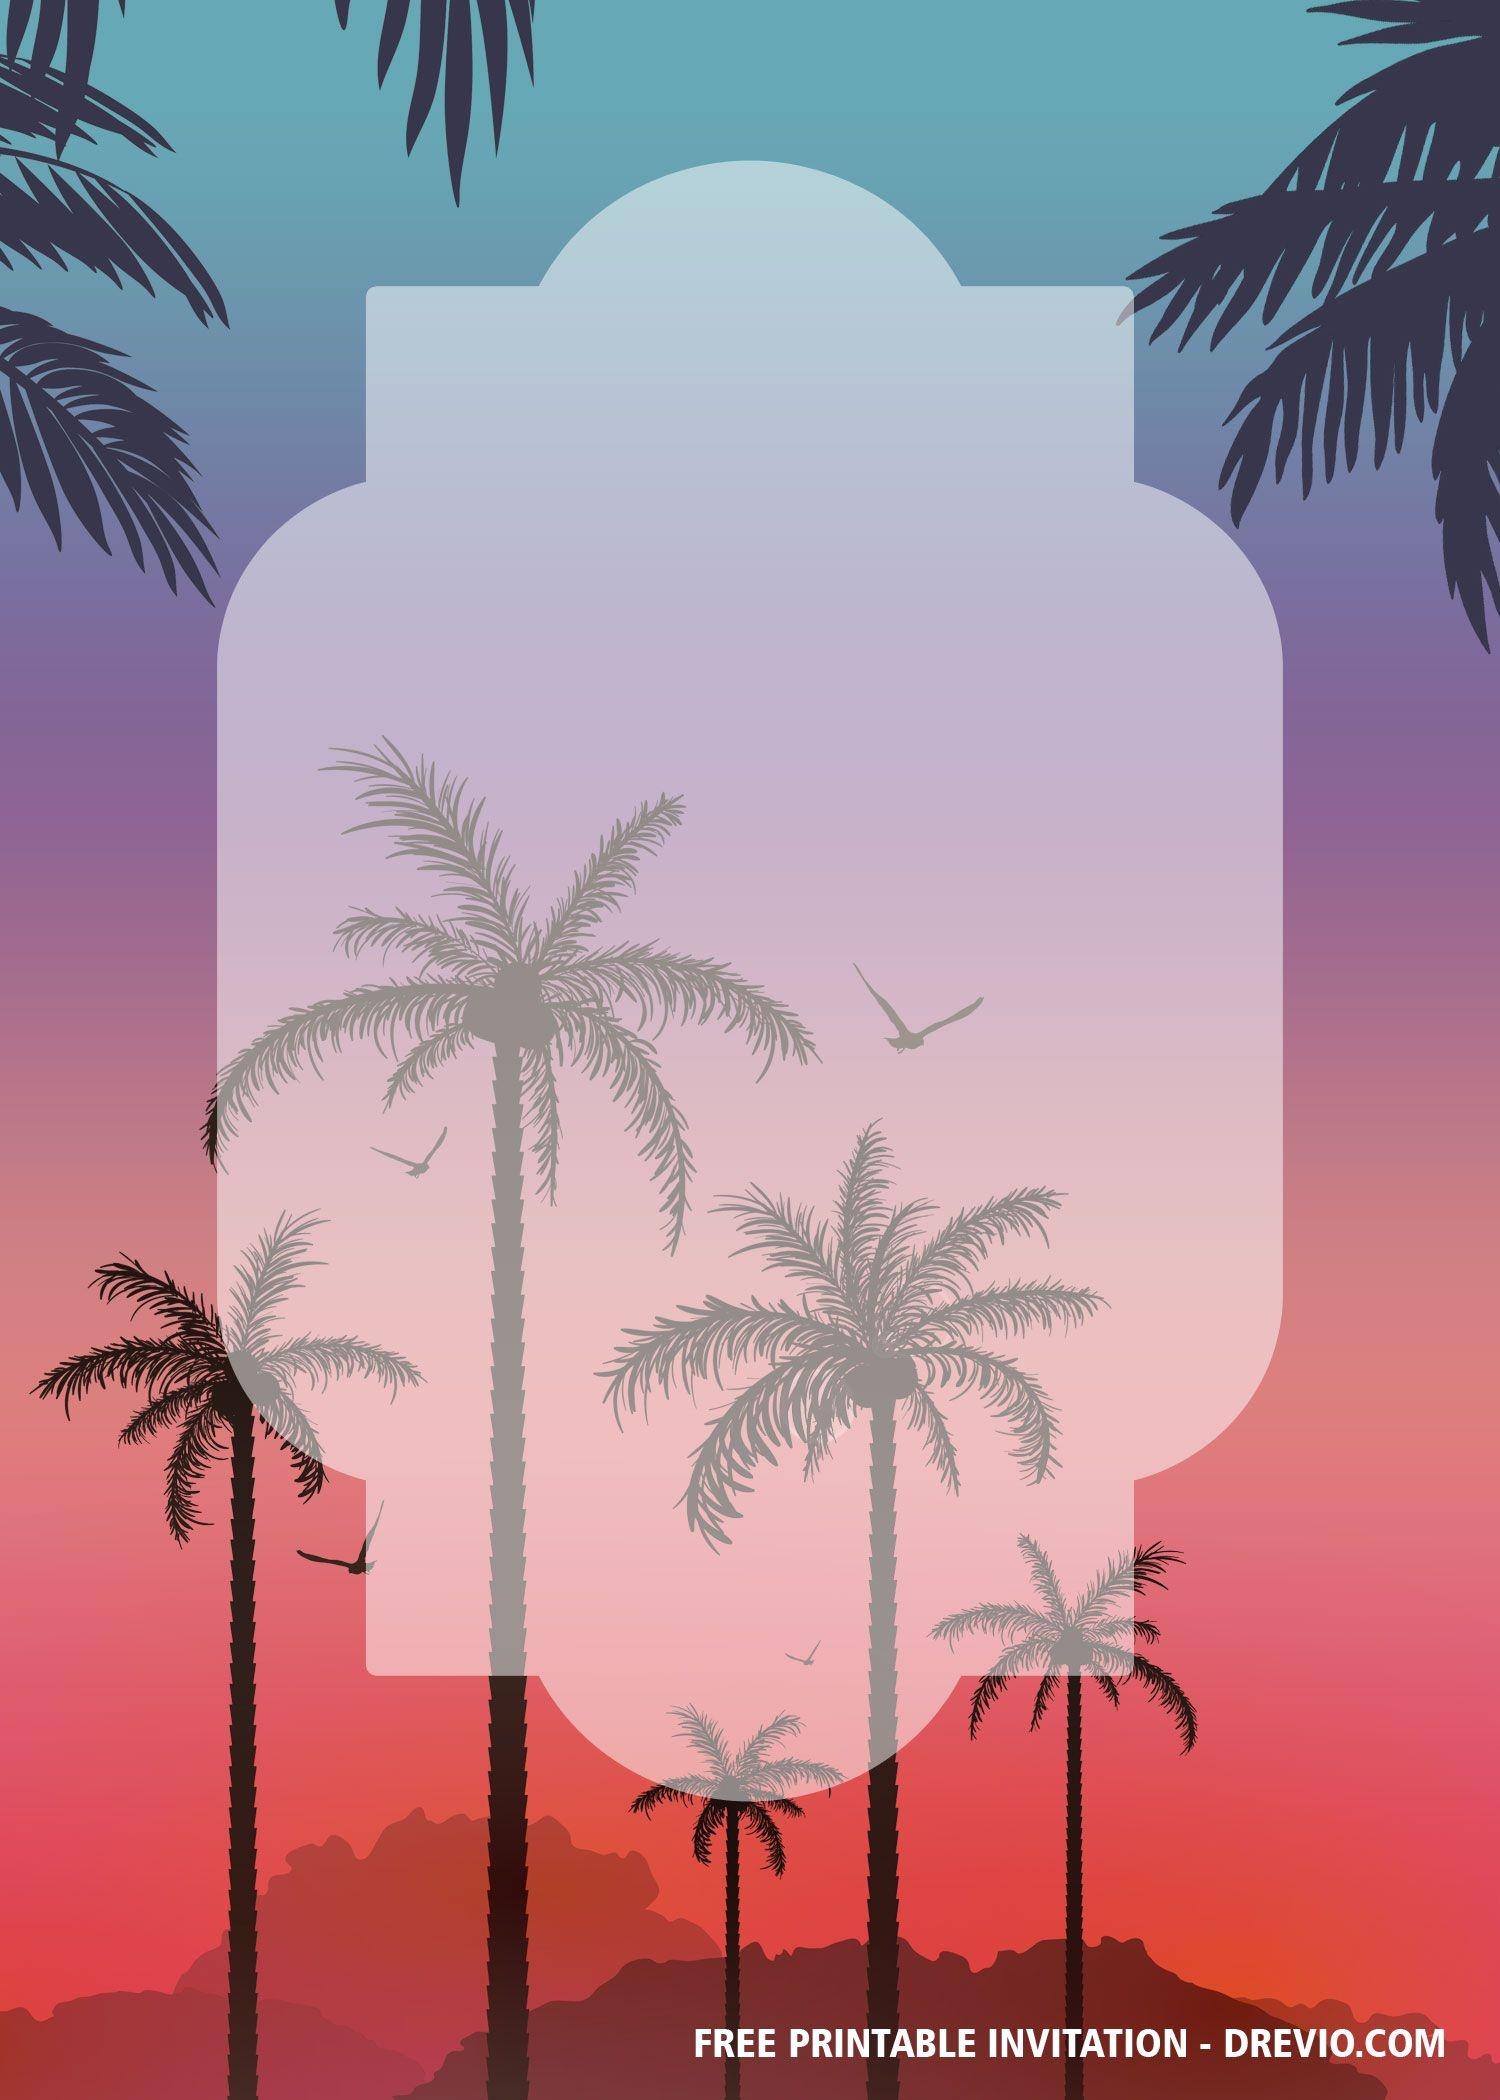 Free Printable Palm Tree Invitation Templates | Bagvania Invitation - Free Printable Palm Tree Template